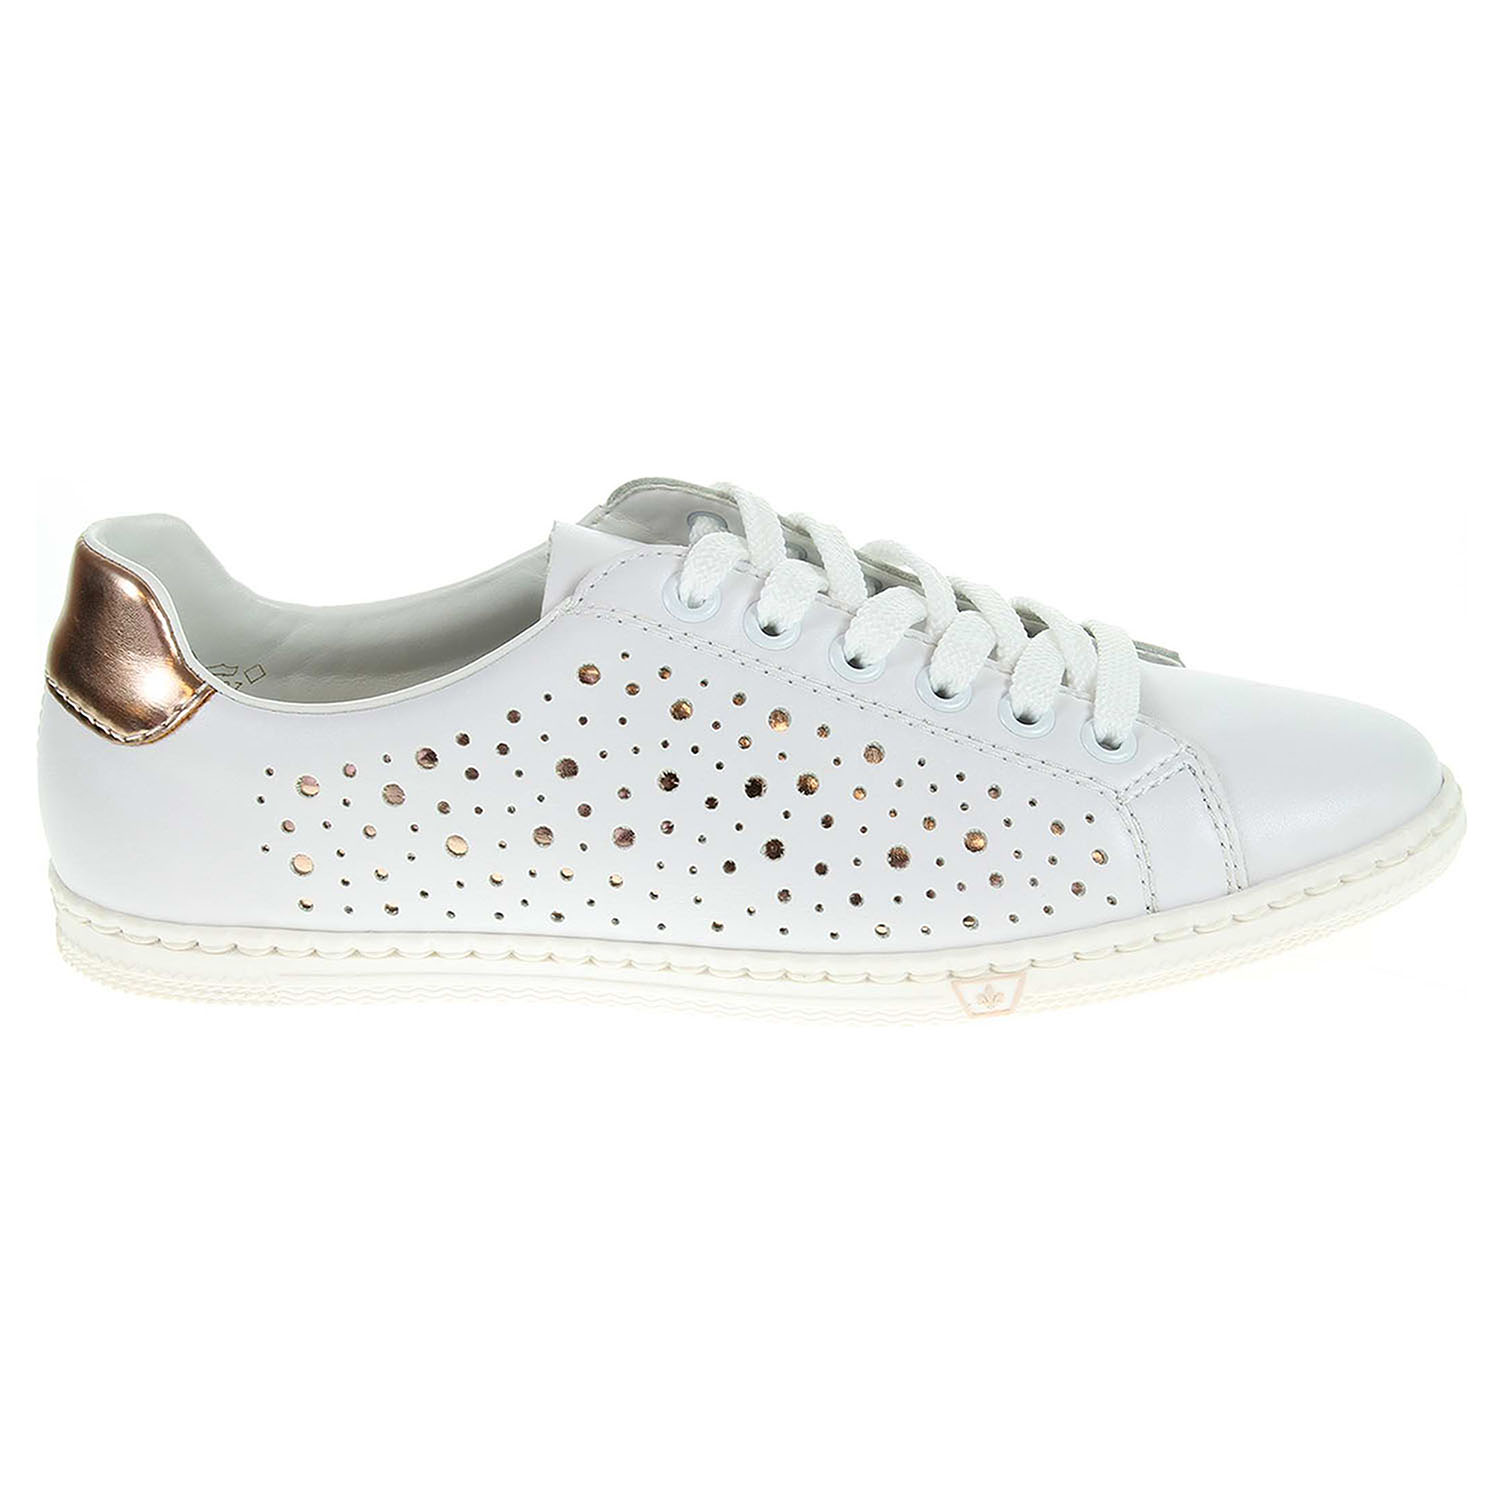 Ecco Rieker dámská obuv M2714-81 weiss 23200757 8458905bb71